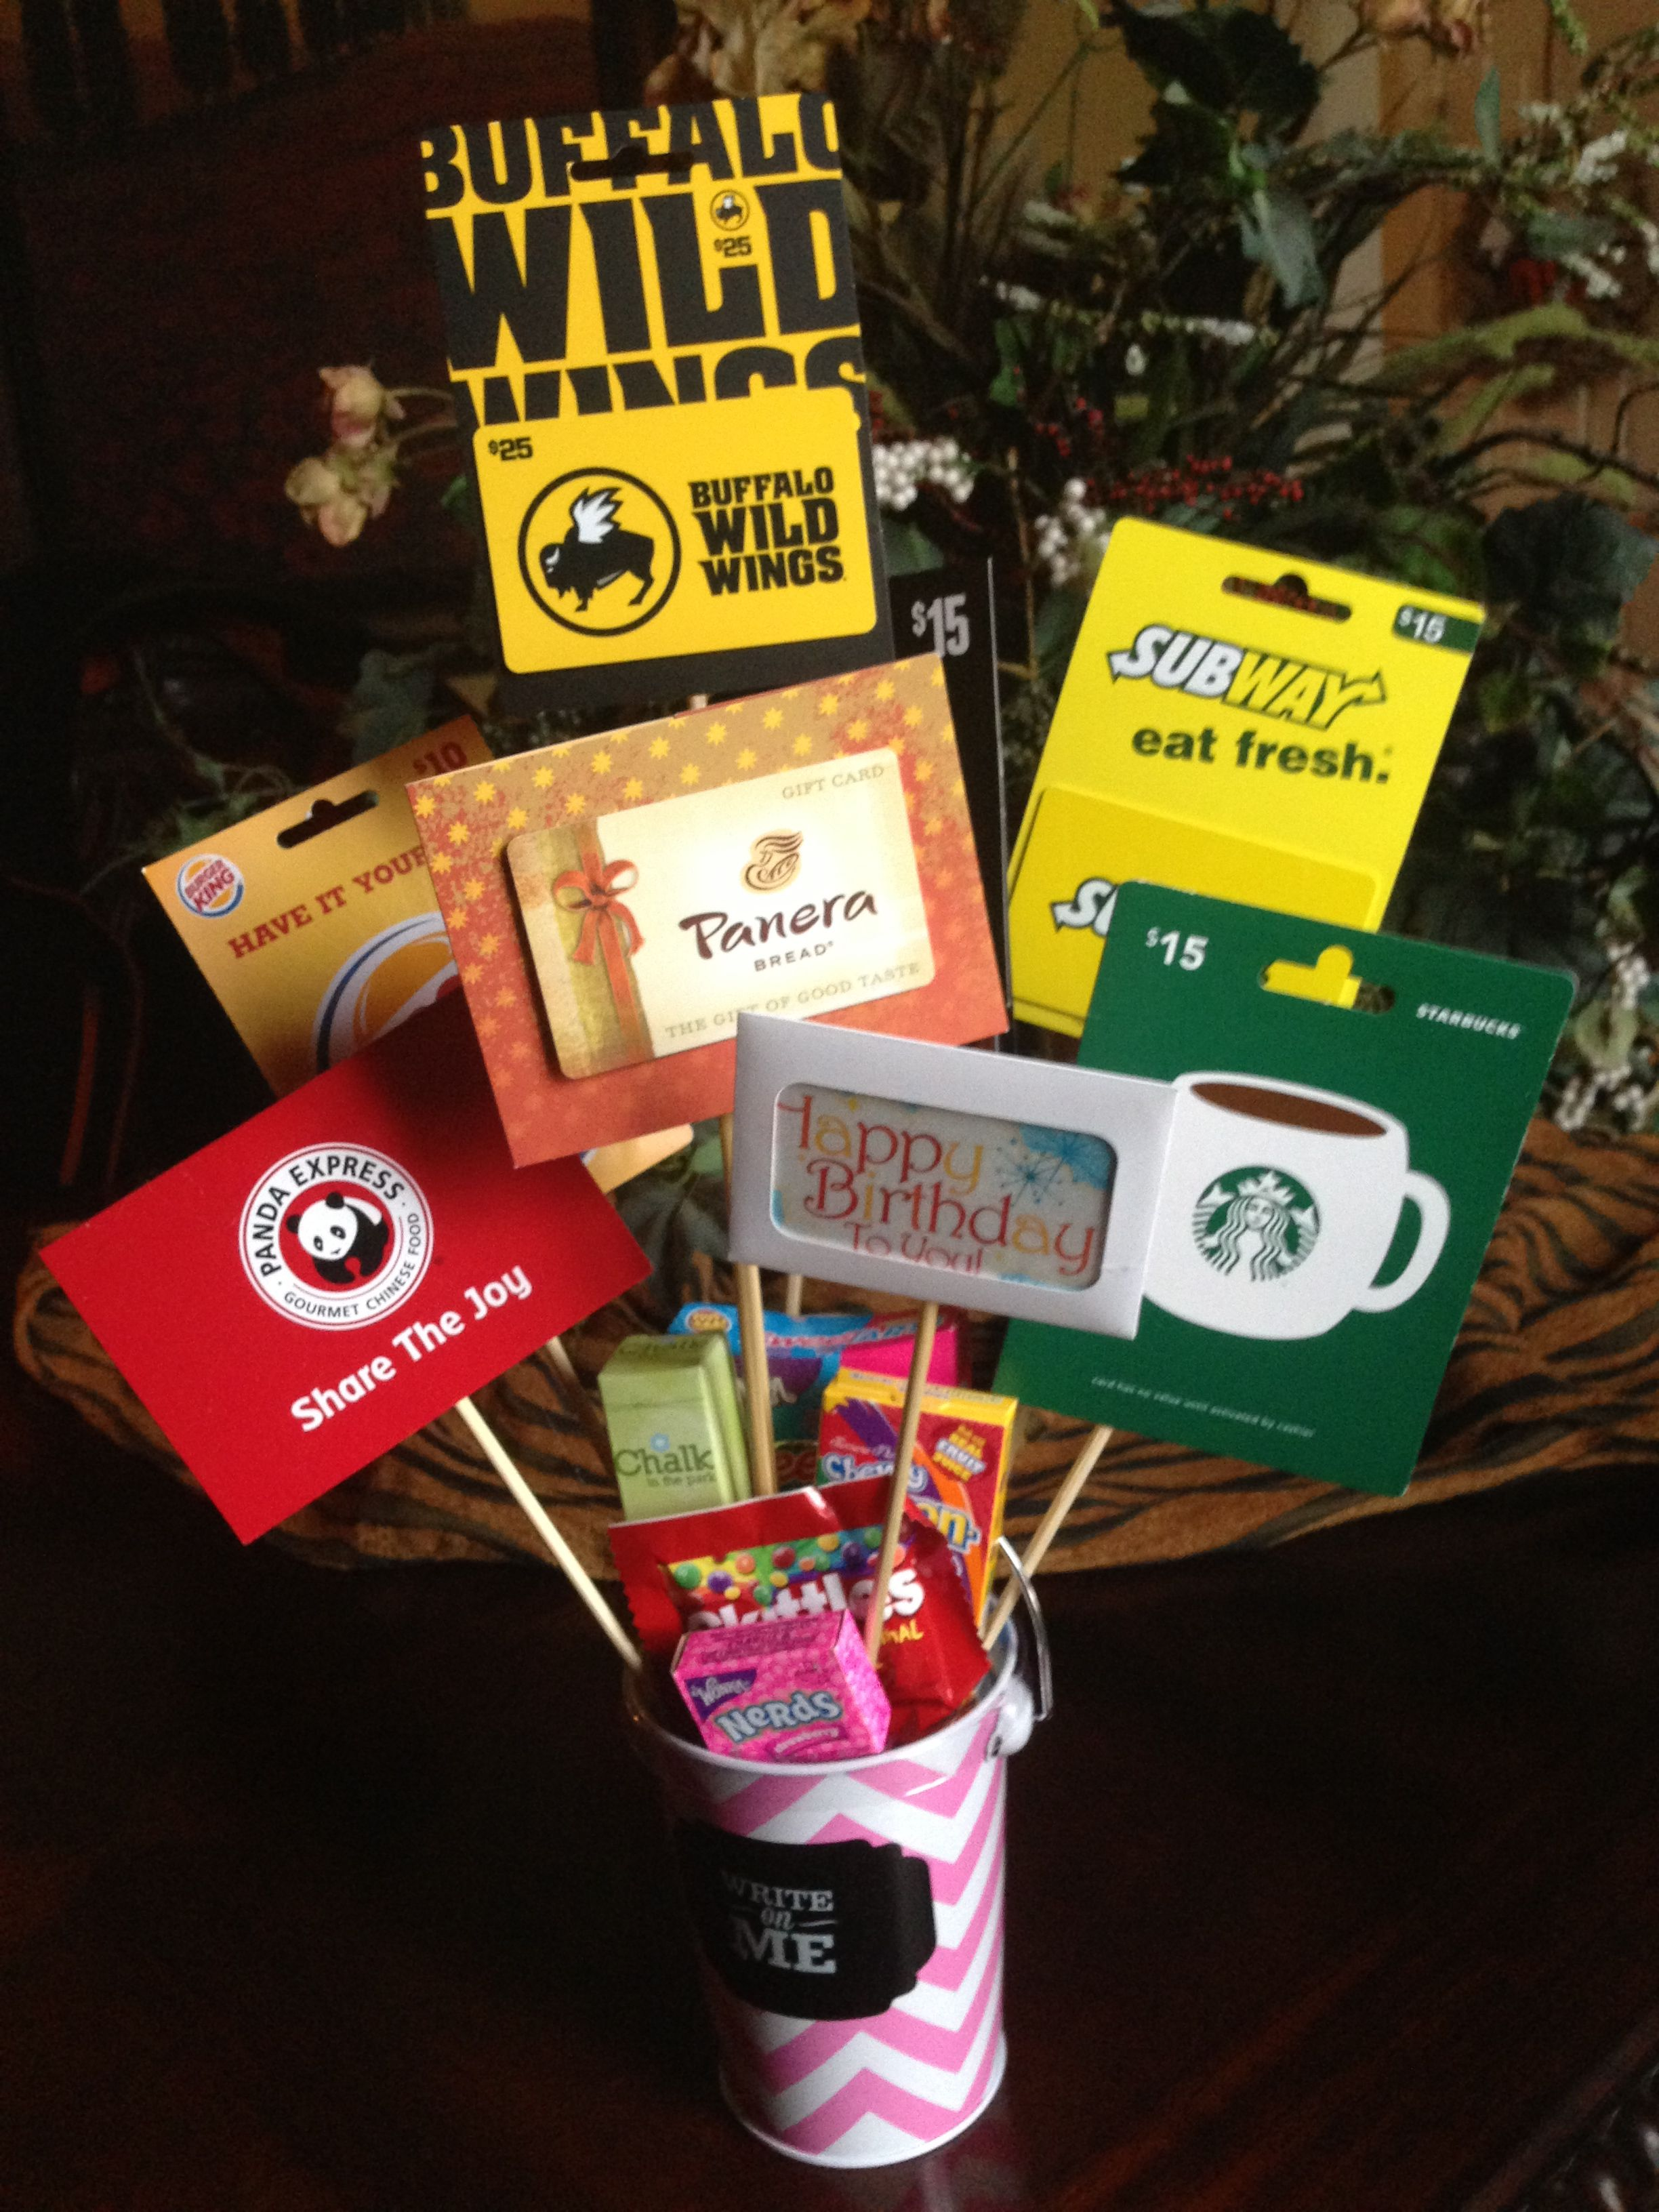 Pin by Jenelle Abbott on Cute gift ideas Birthday gift